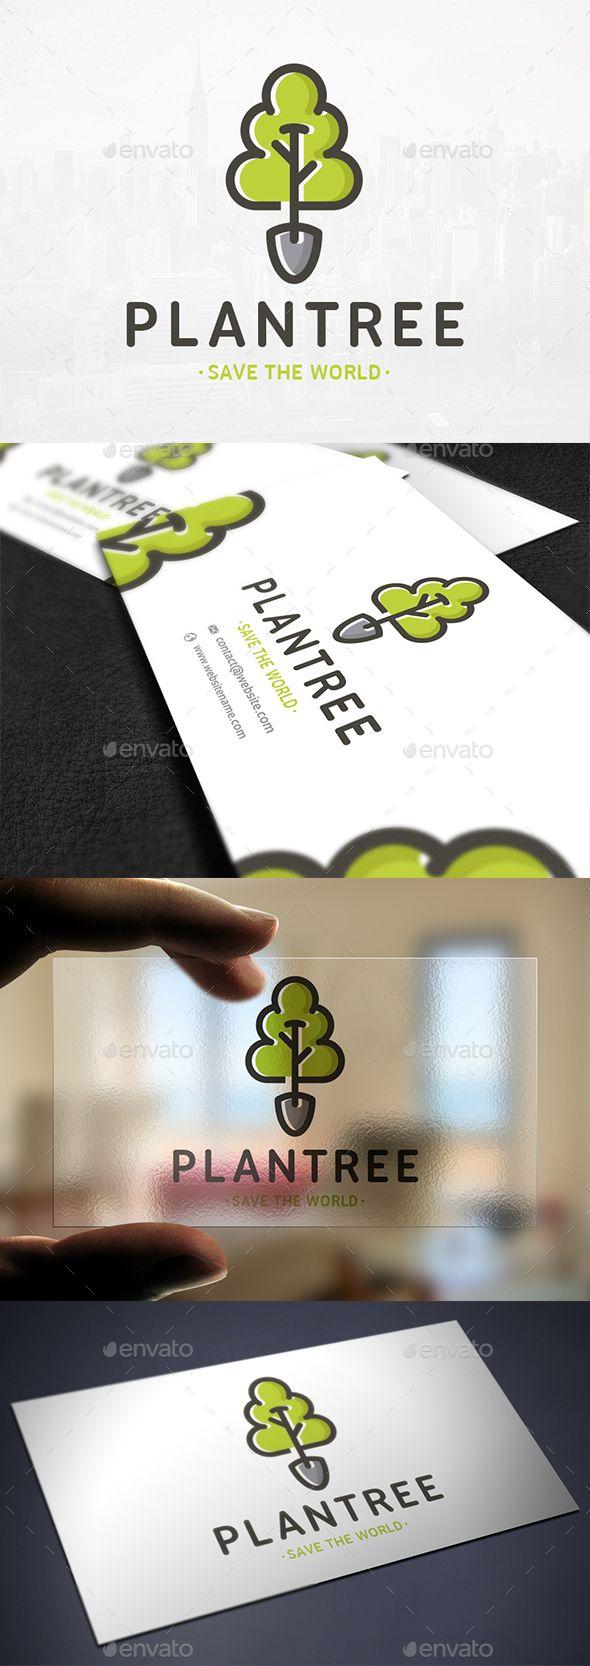 Plant a Tree Logo Template Tree logos, Natural logo